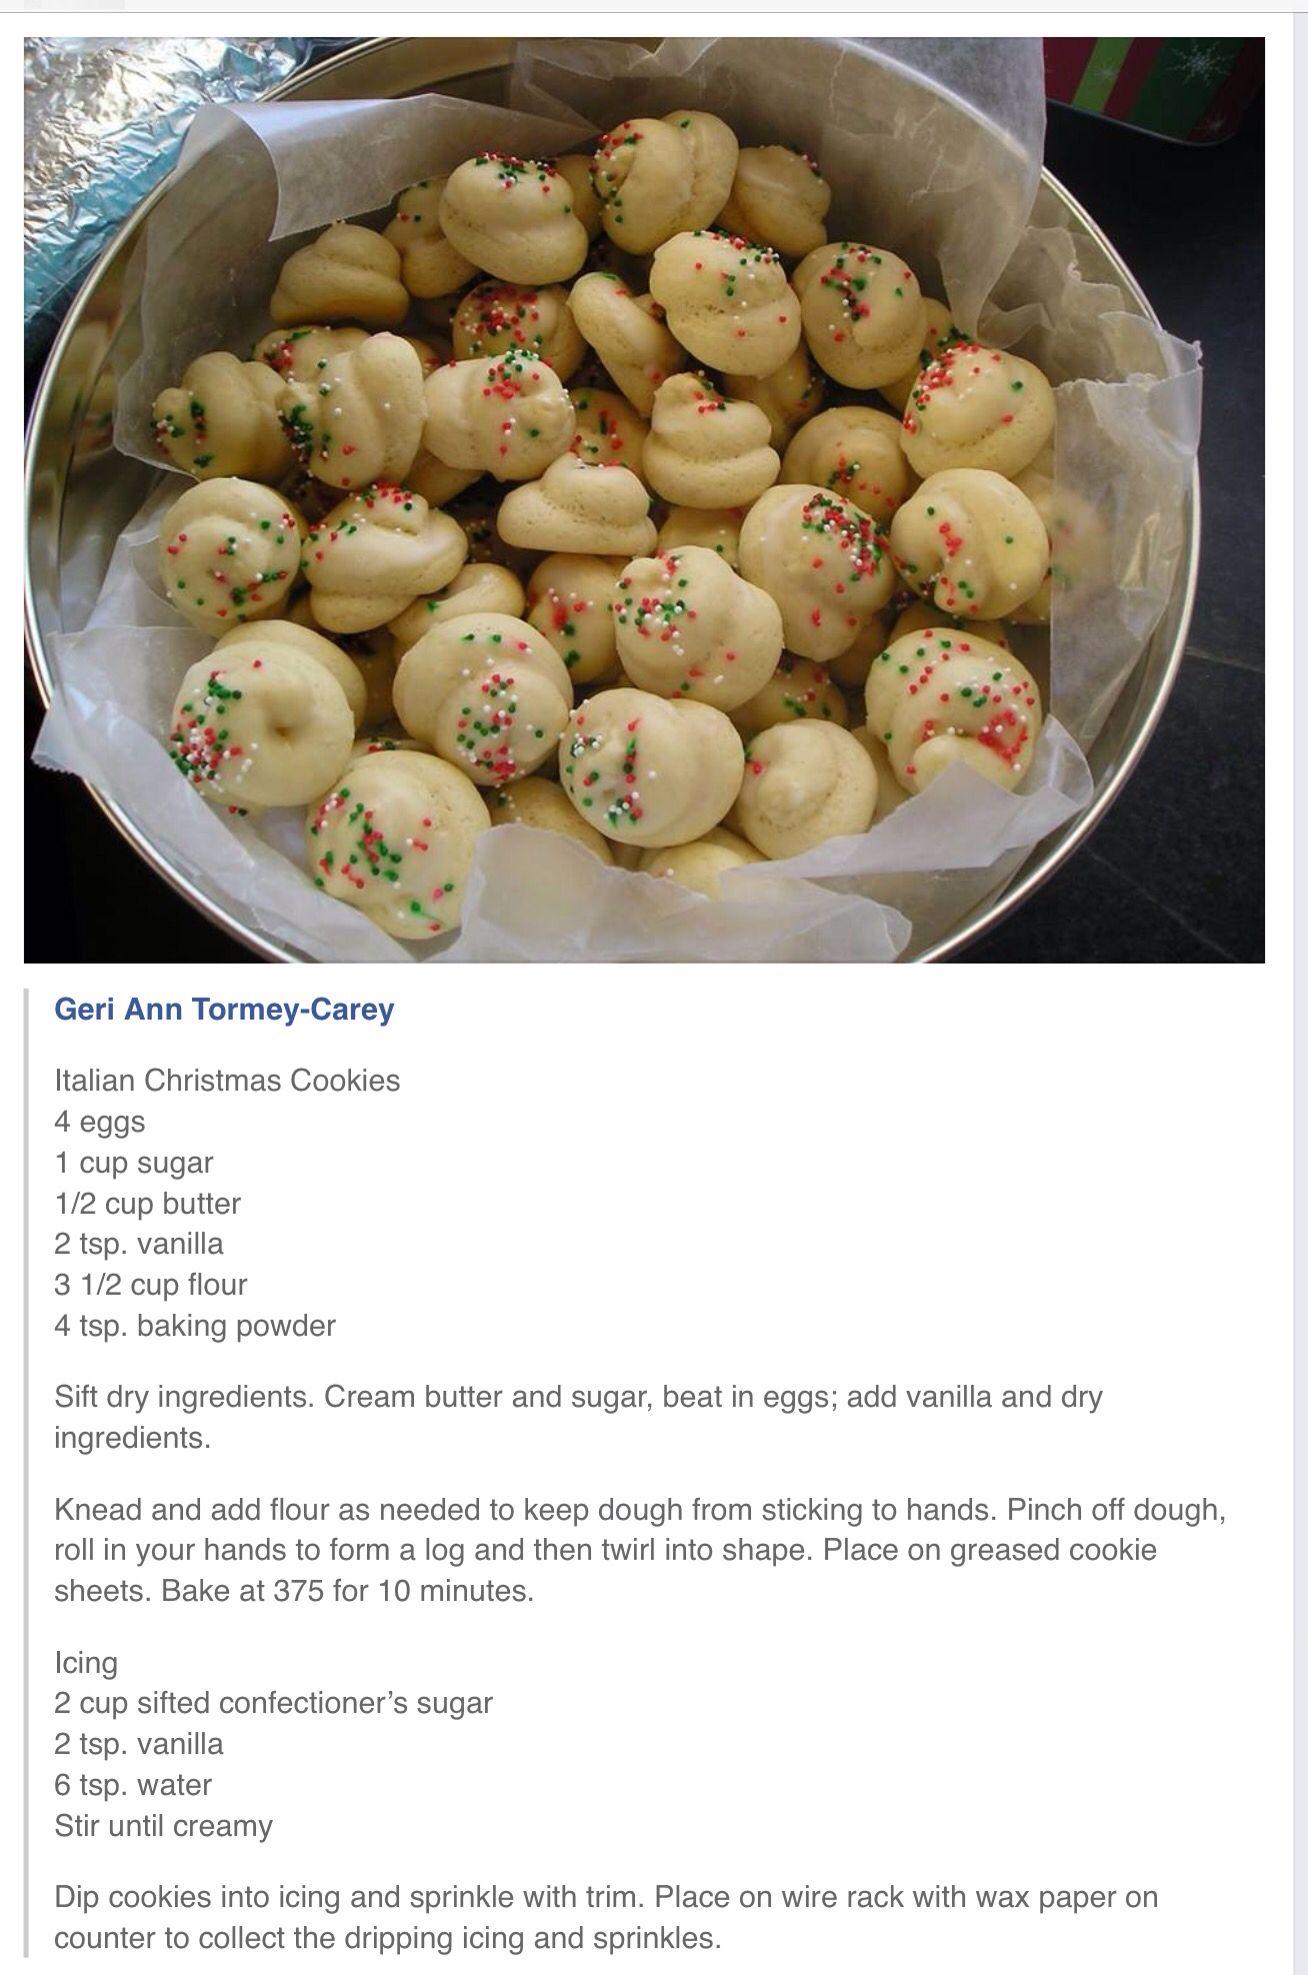 Italian Christmas Cookie Recipe | Yummy Looking Recipes! | Pinterest ...